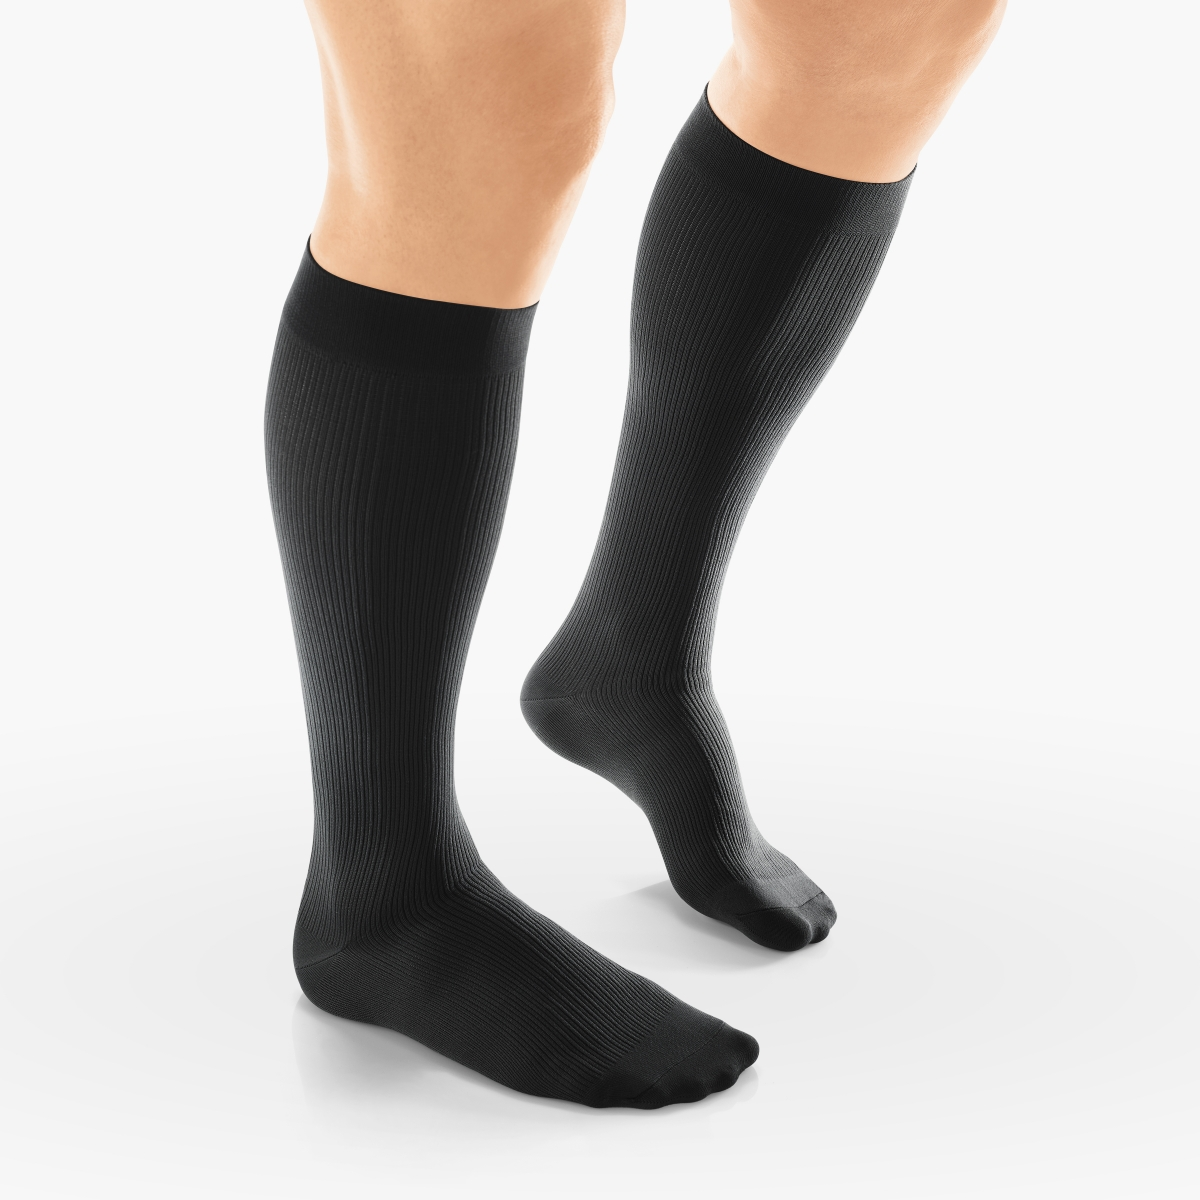 VENOSAN Sup F Men, Business, Below Knee 20-30, Black, M Firm 20-30 mmHg | Black | M |  | Closed Toe | Knit Top